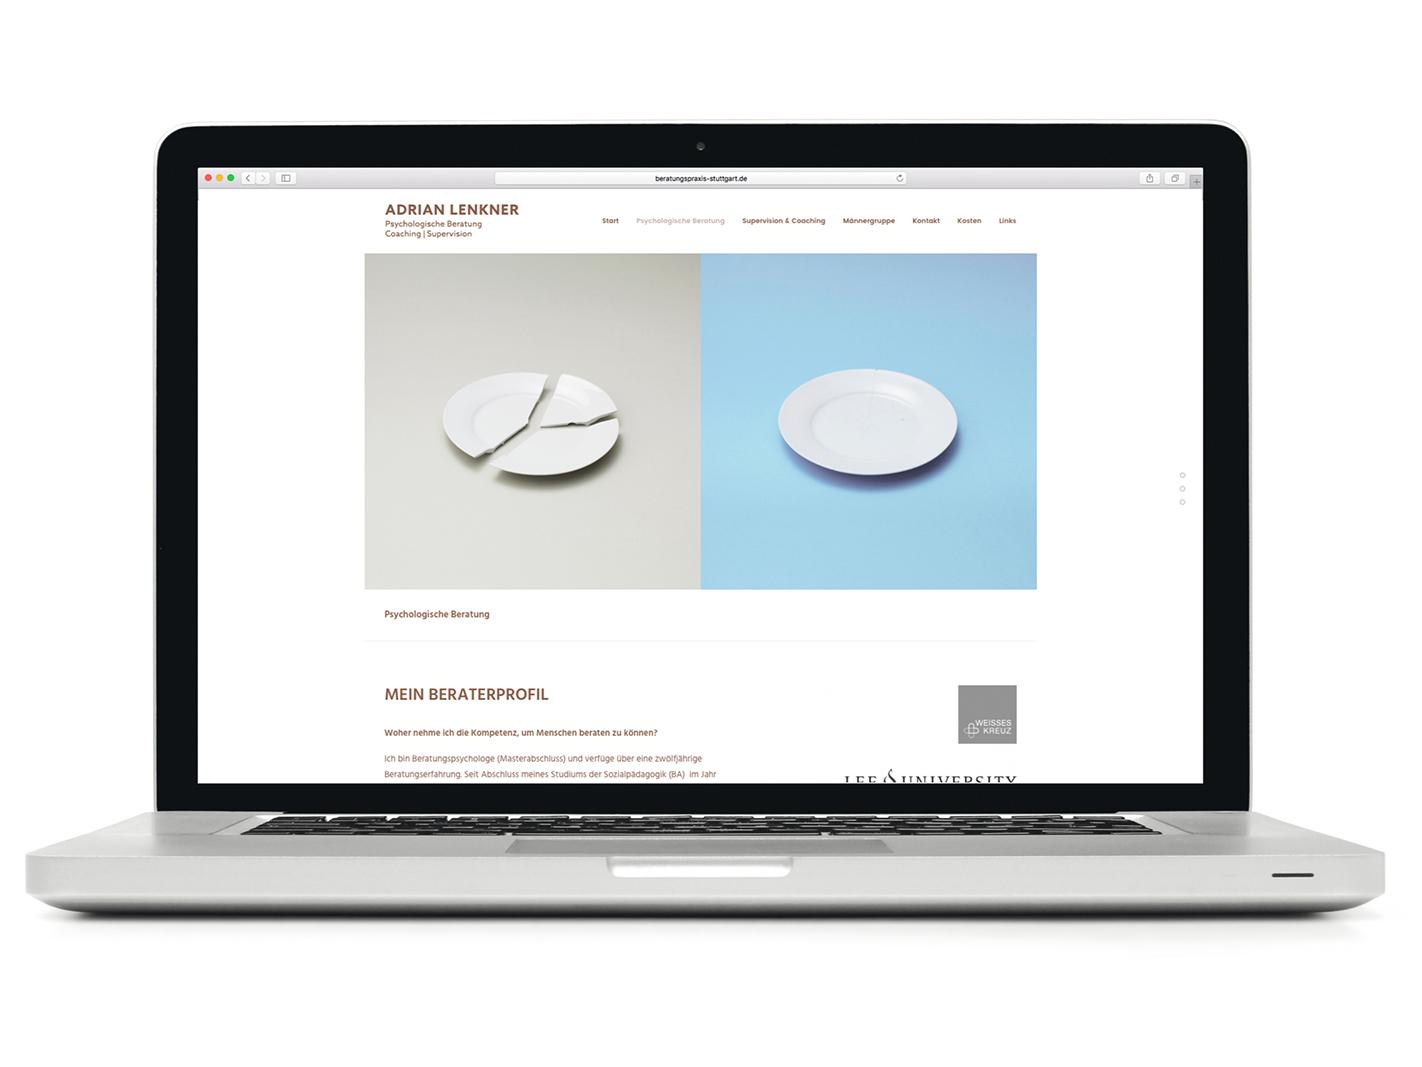 ATK-LENKNER-coaching-beratung-Corporate-Design-1010.jpg